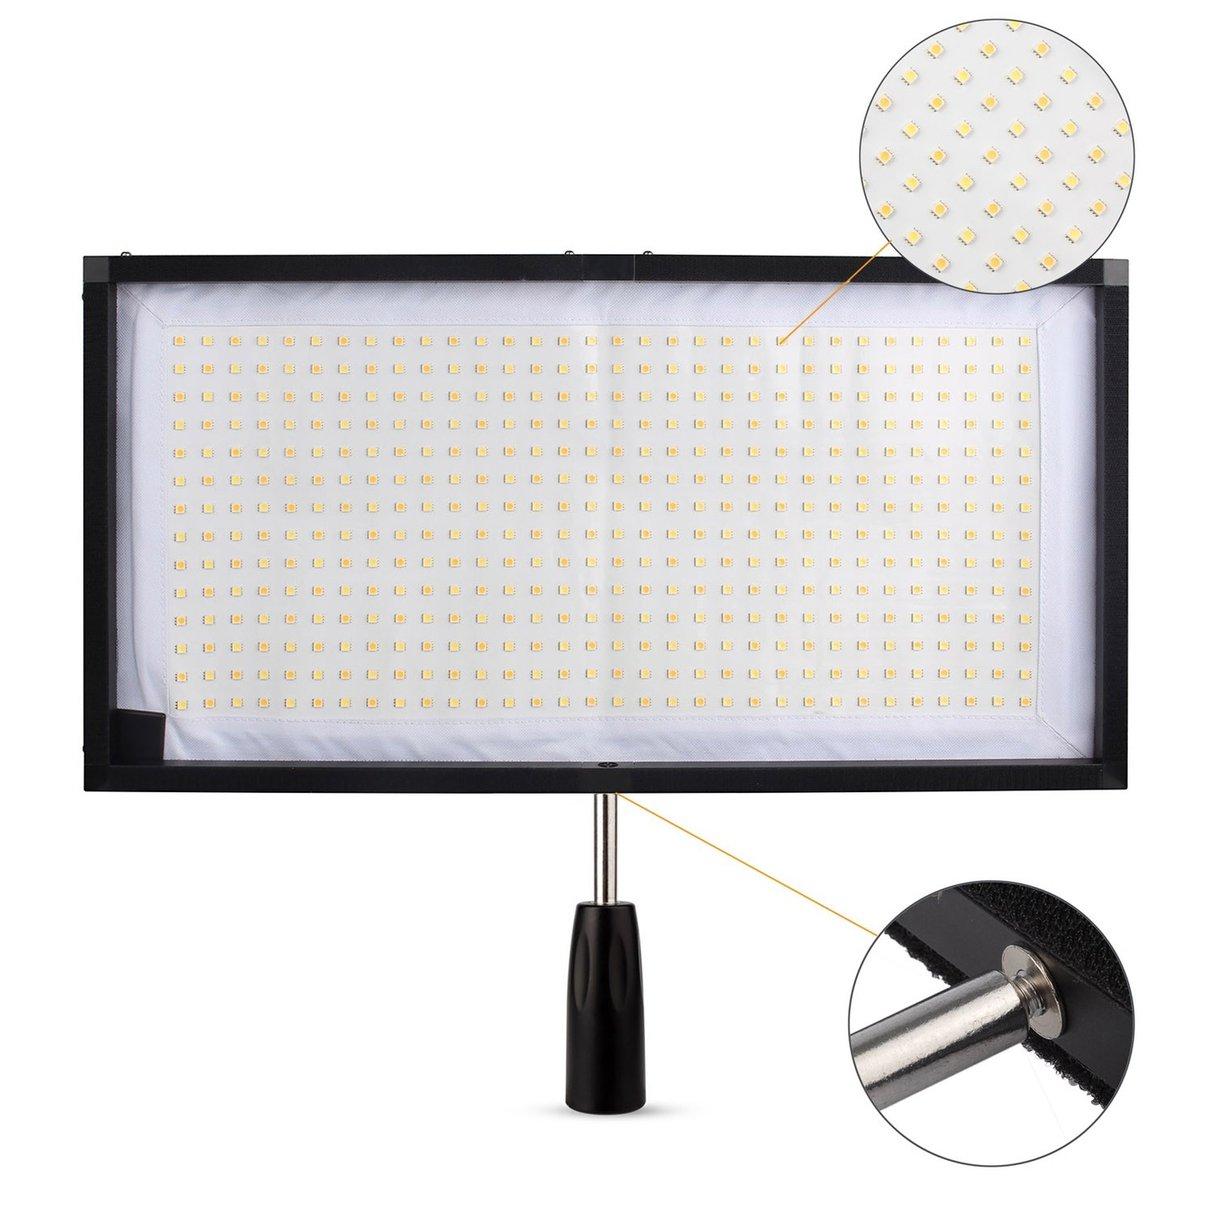 Travor FL 3060 Flex Mat 5500K 480 LED Flexible Moldable LED Video Light for Camera Video + 2.4G Remote